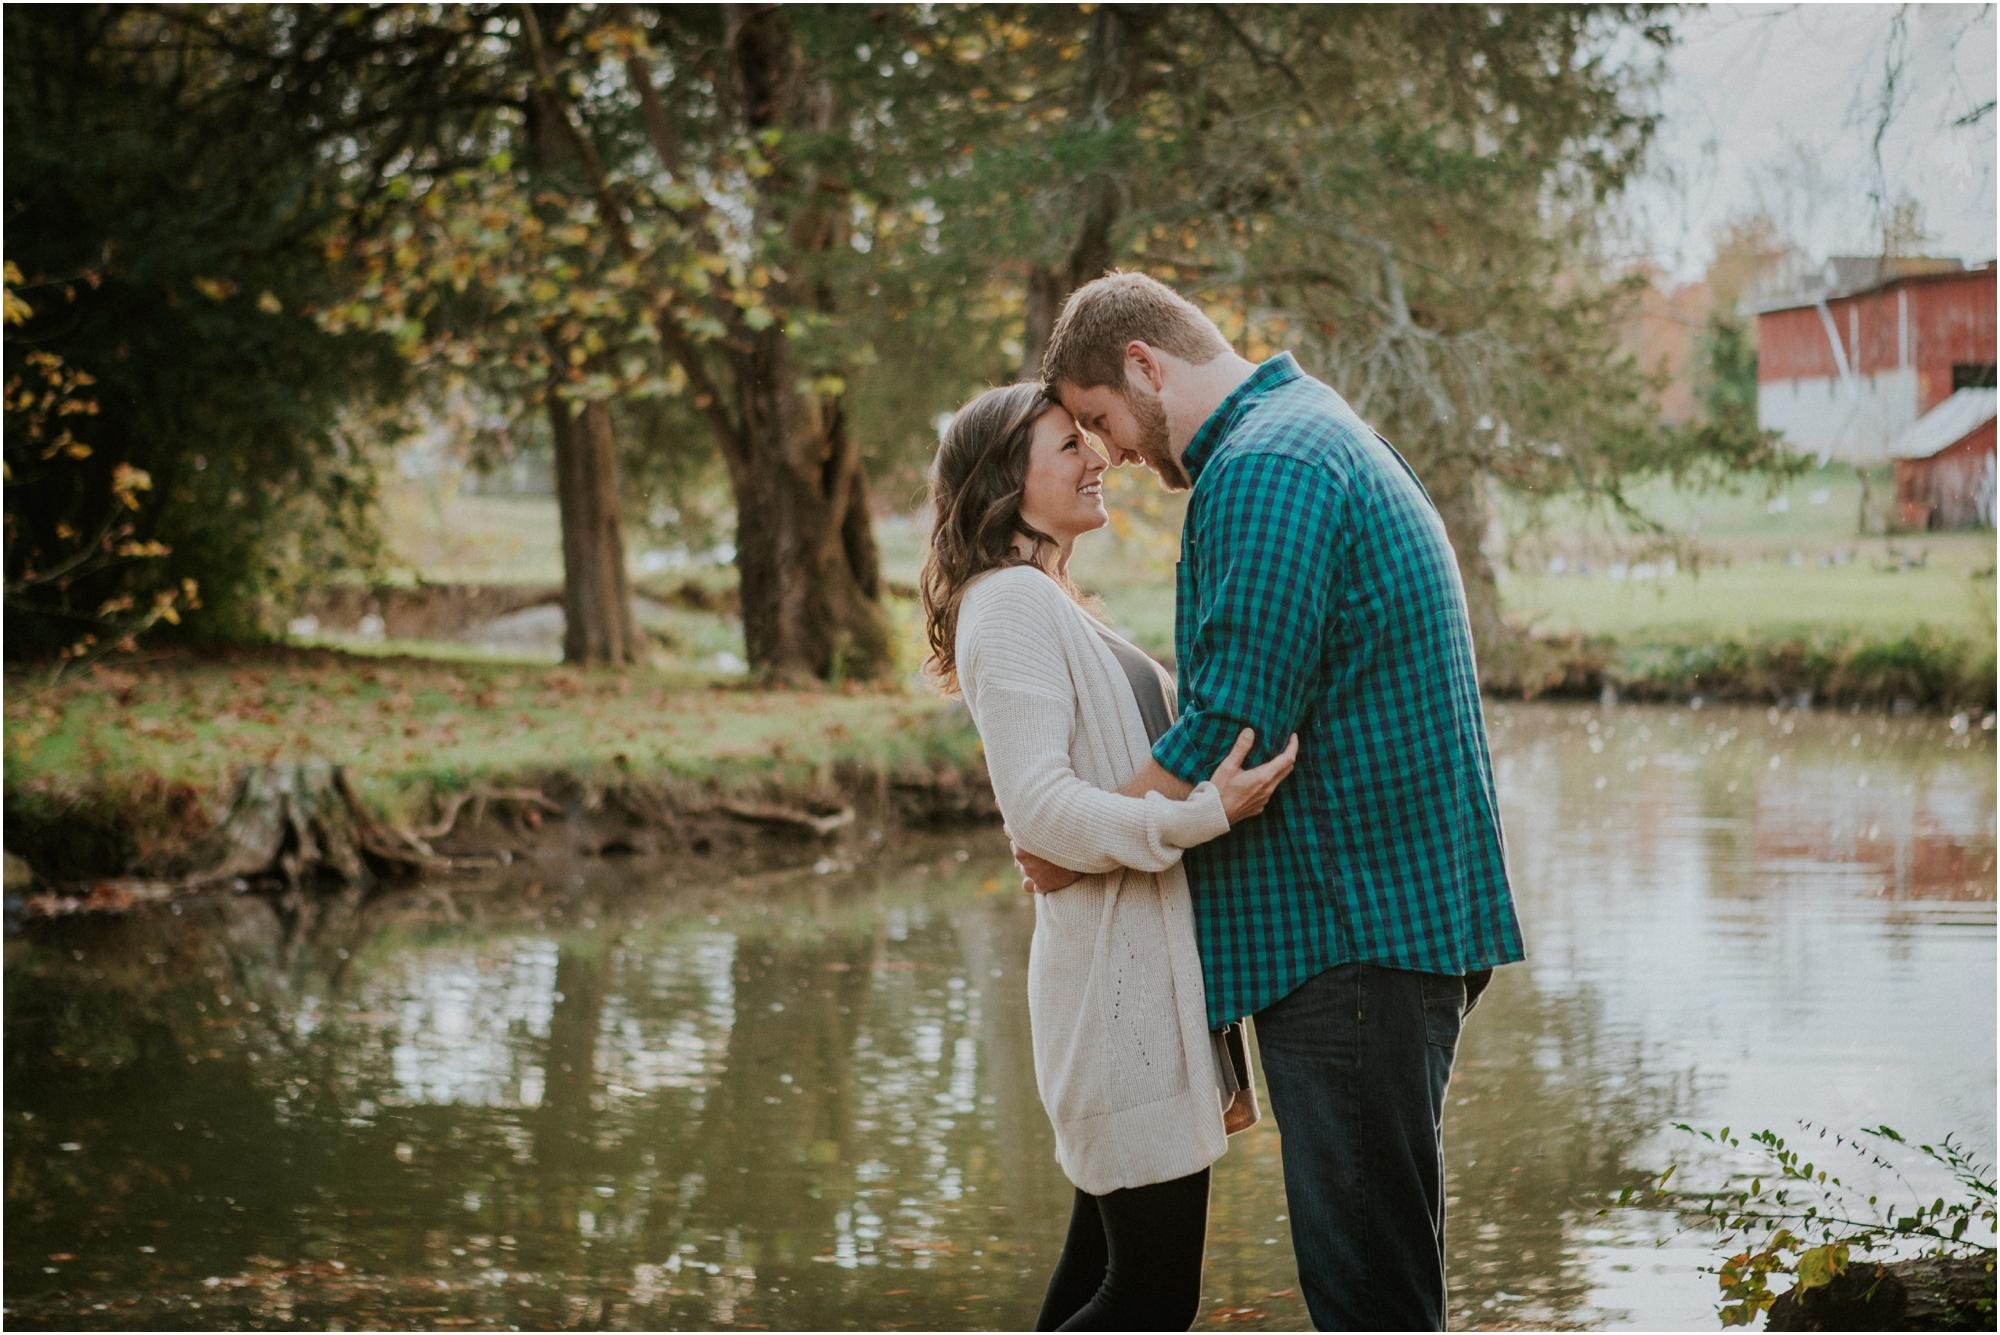 katy-sergent-millstone-limestone-tn-rustic-fall-engagement-session-adventurous-outdoors-intimate-elopement-wedding-northeast-johnson-city-photographer_0010.jpg